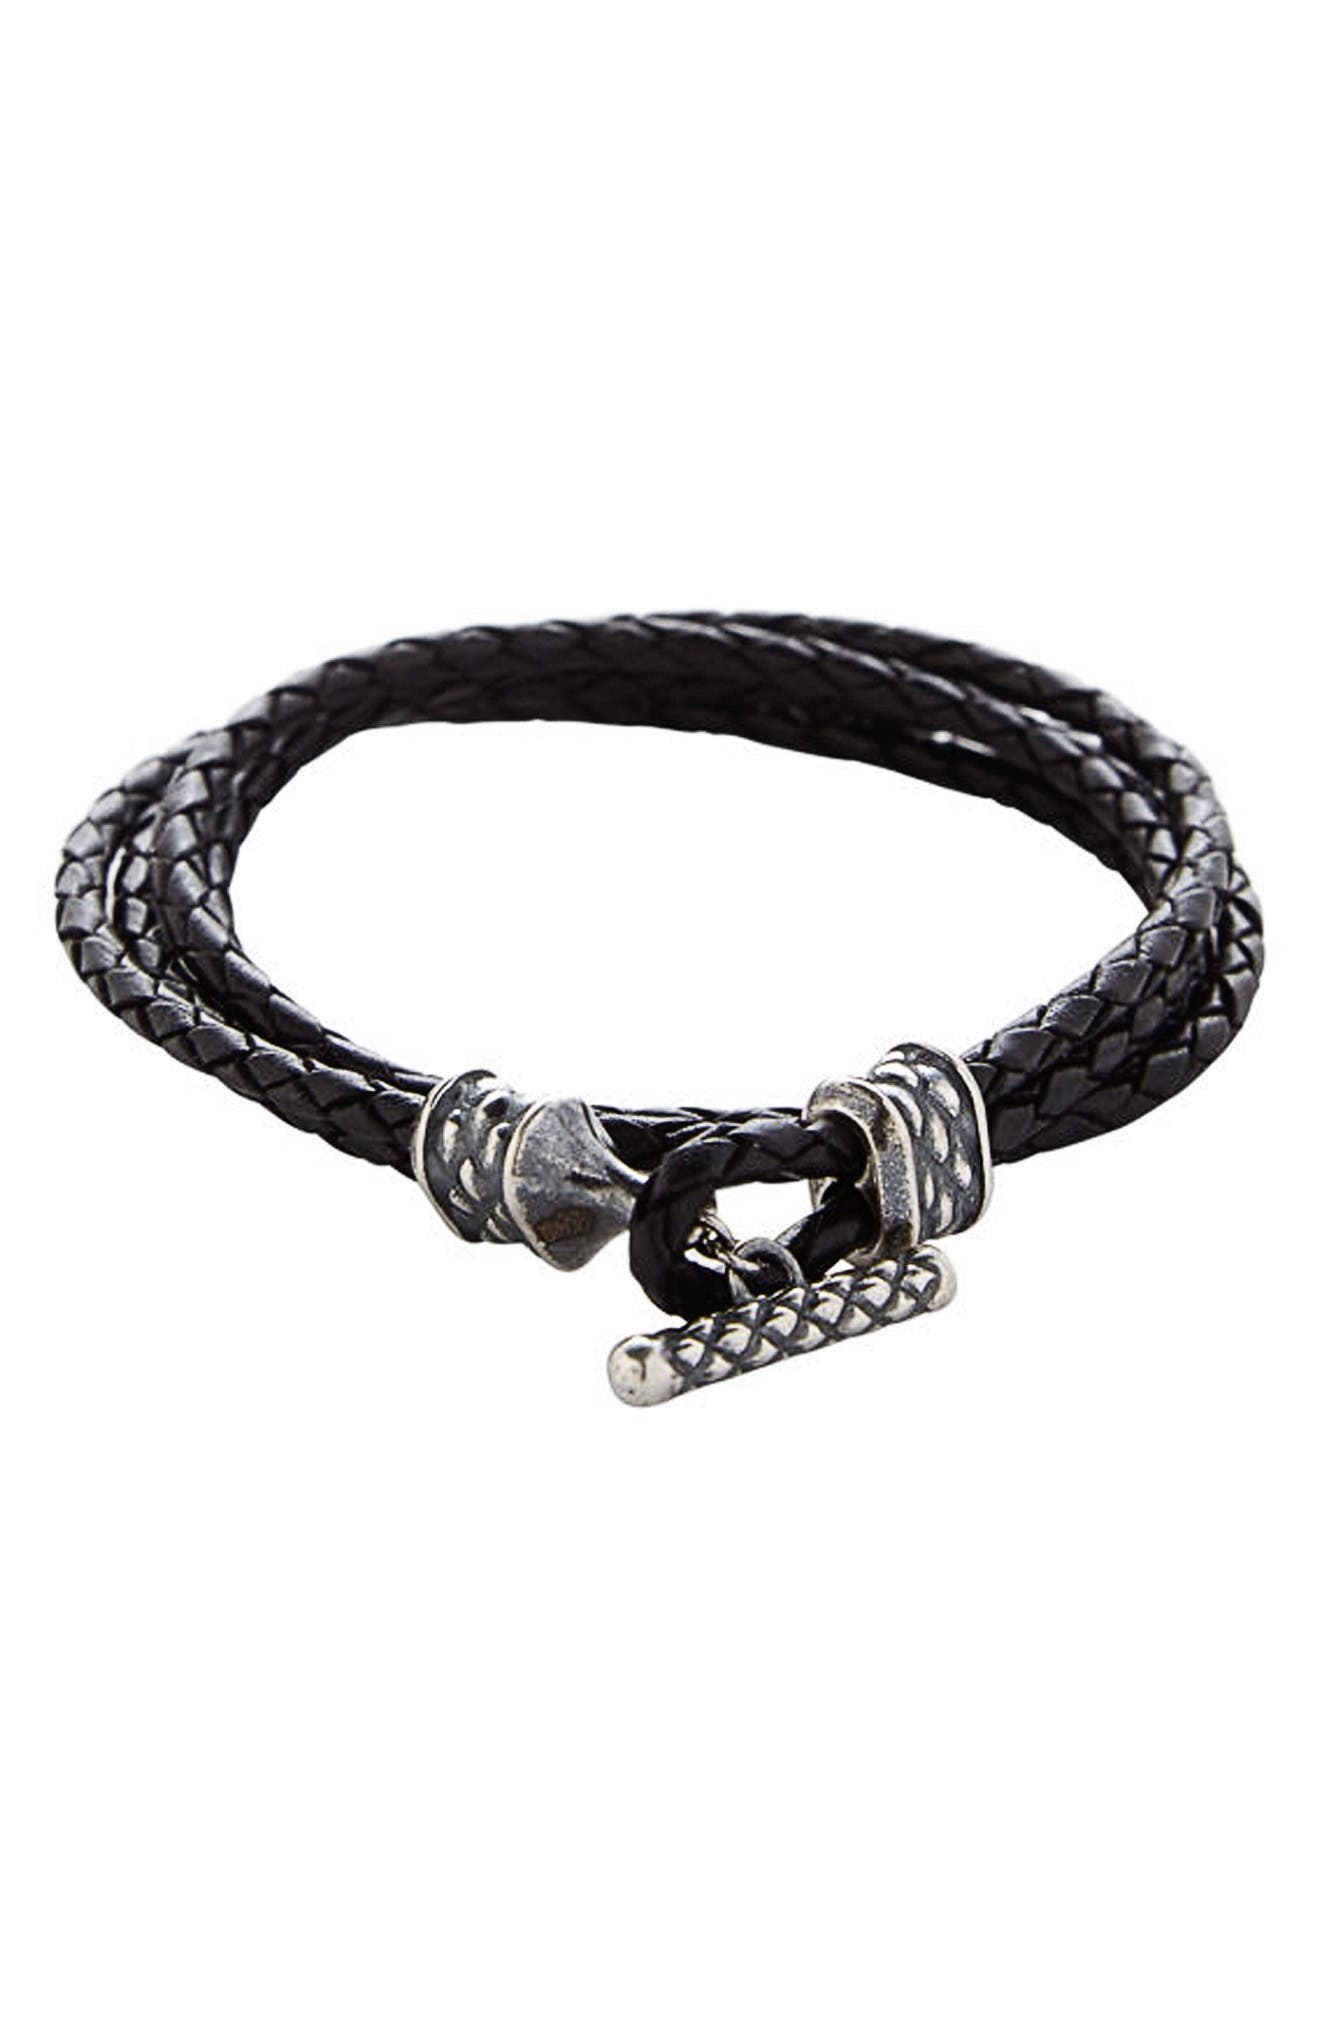 DEGS & SAL Stealth Leather Wrap Bracelet